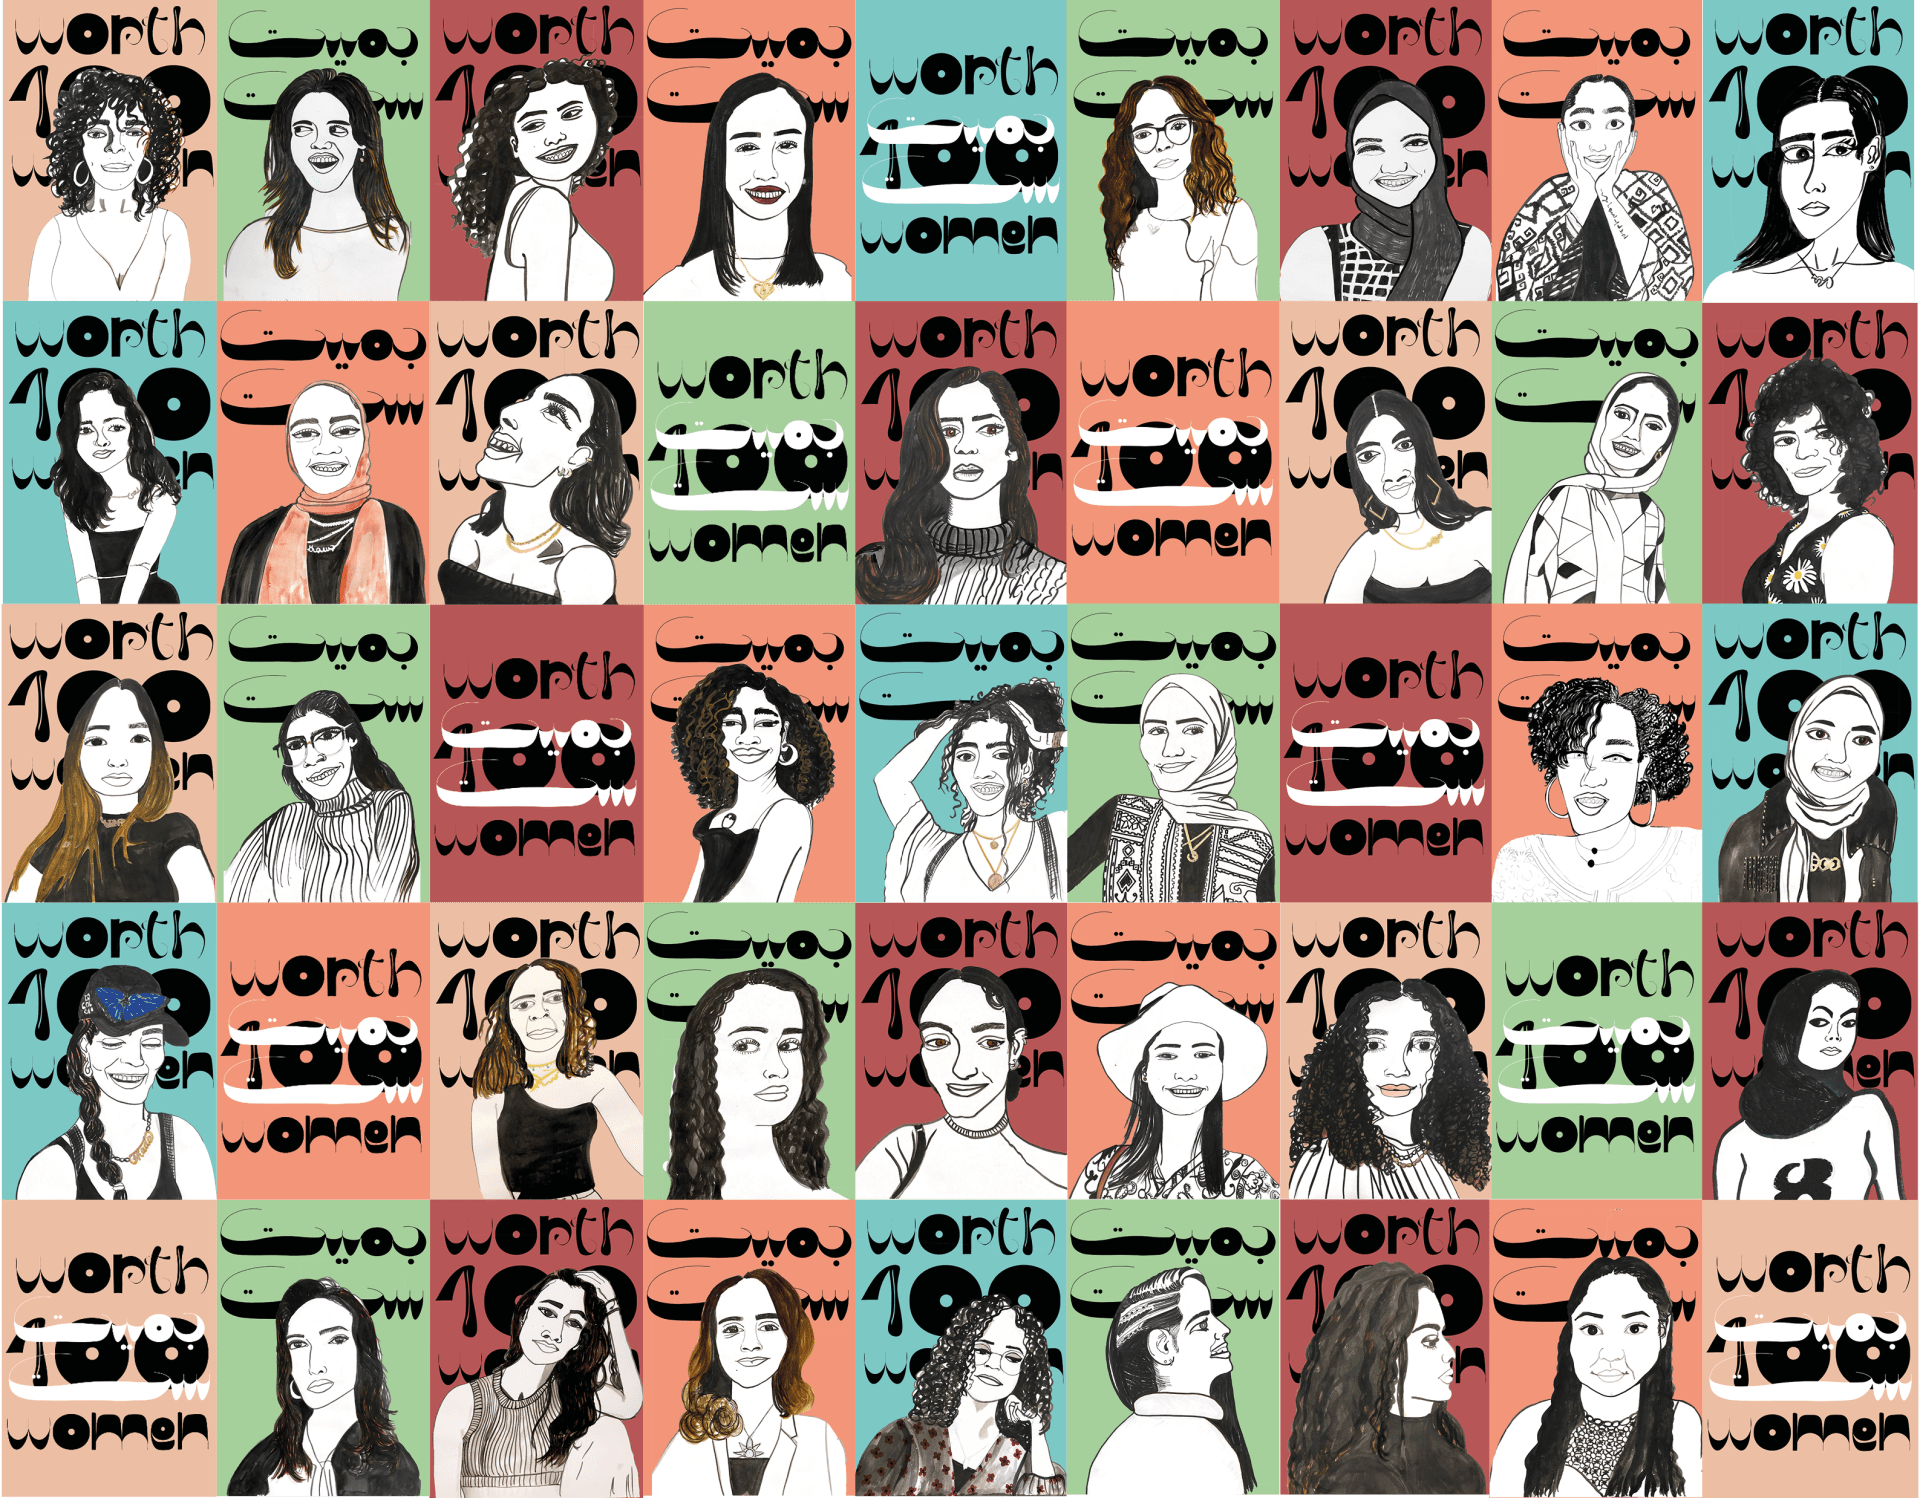 Illustrated portraits of women